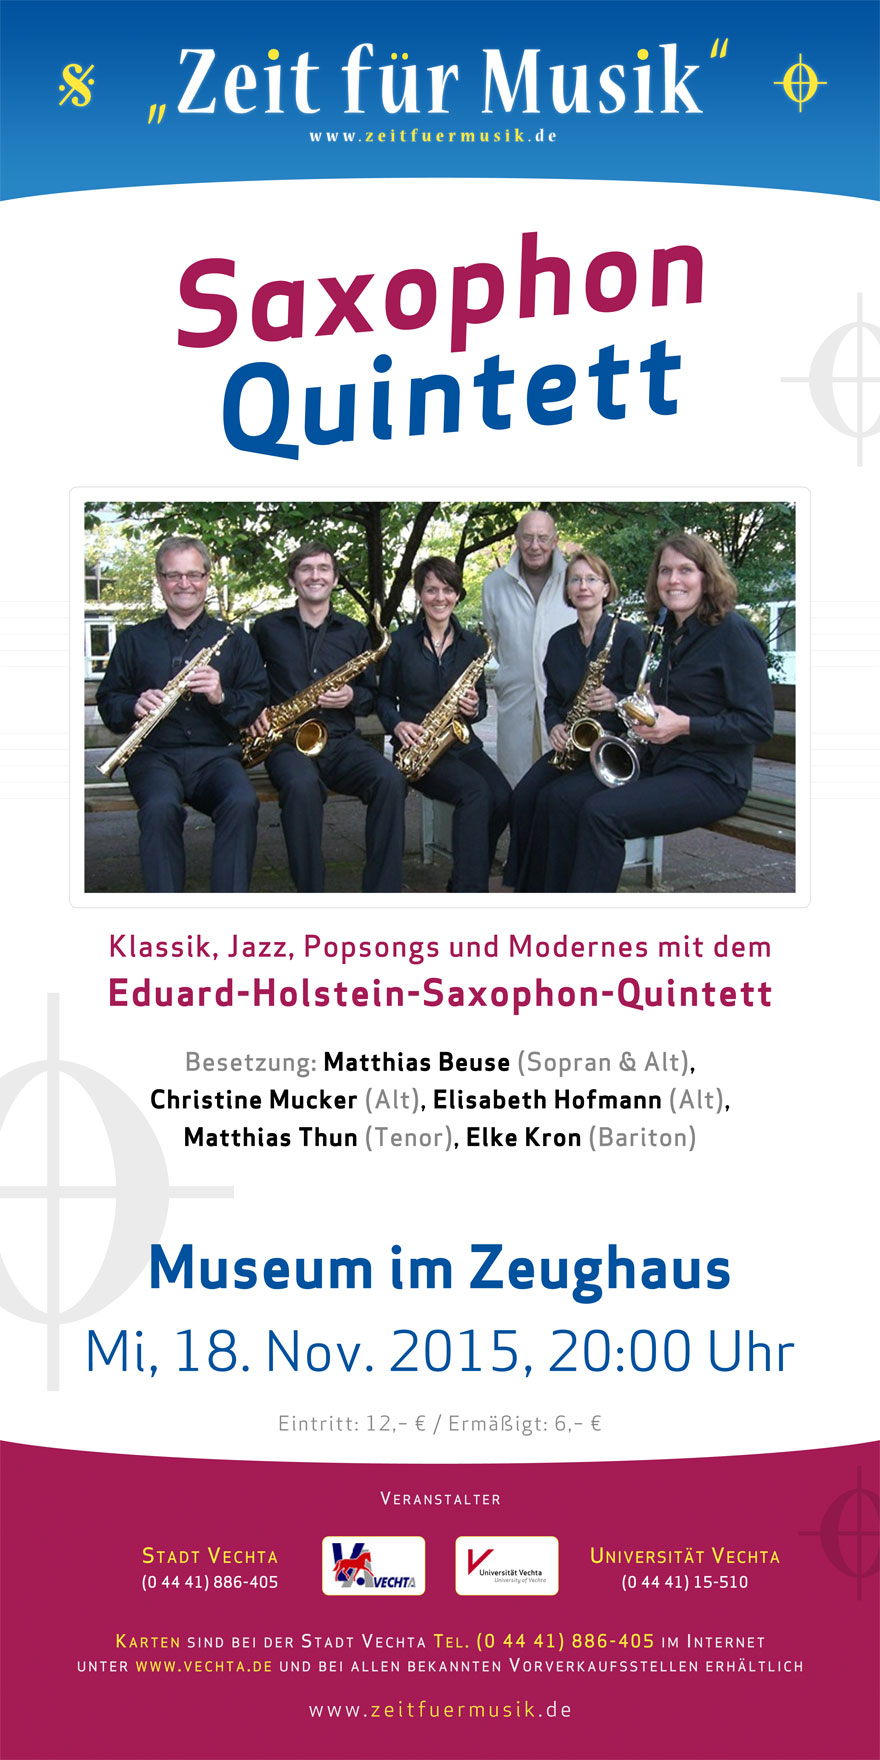 Saxophon-Quintett